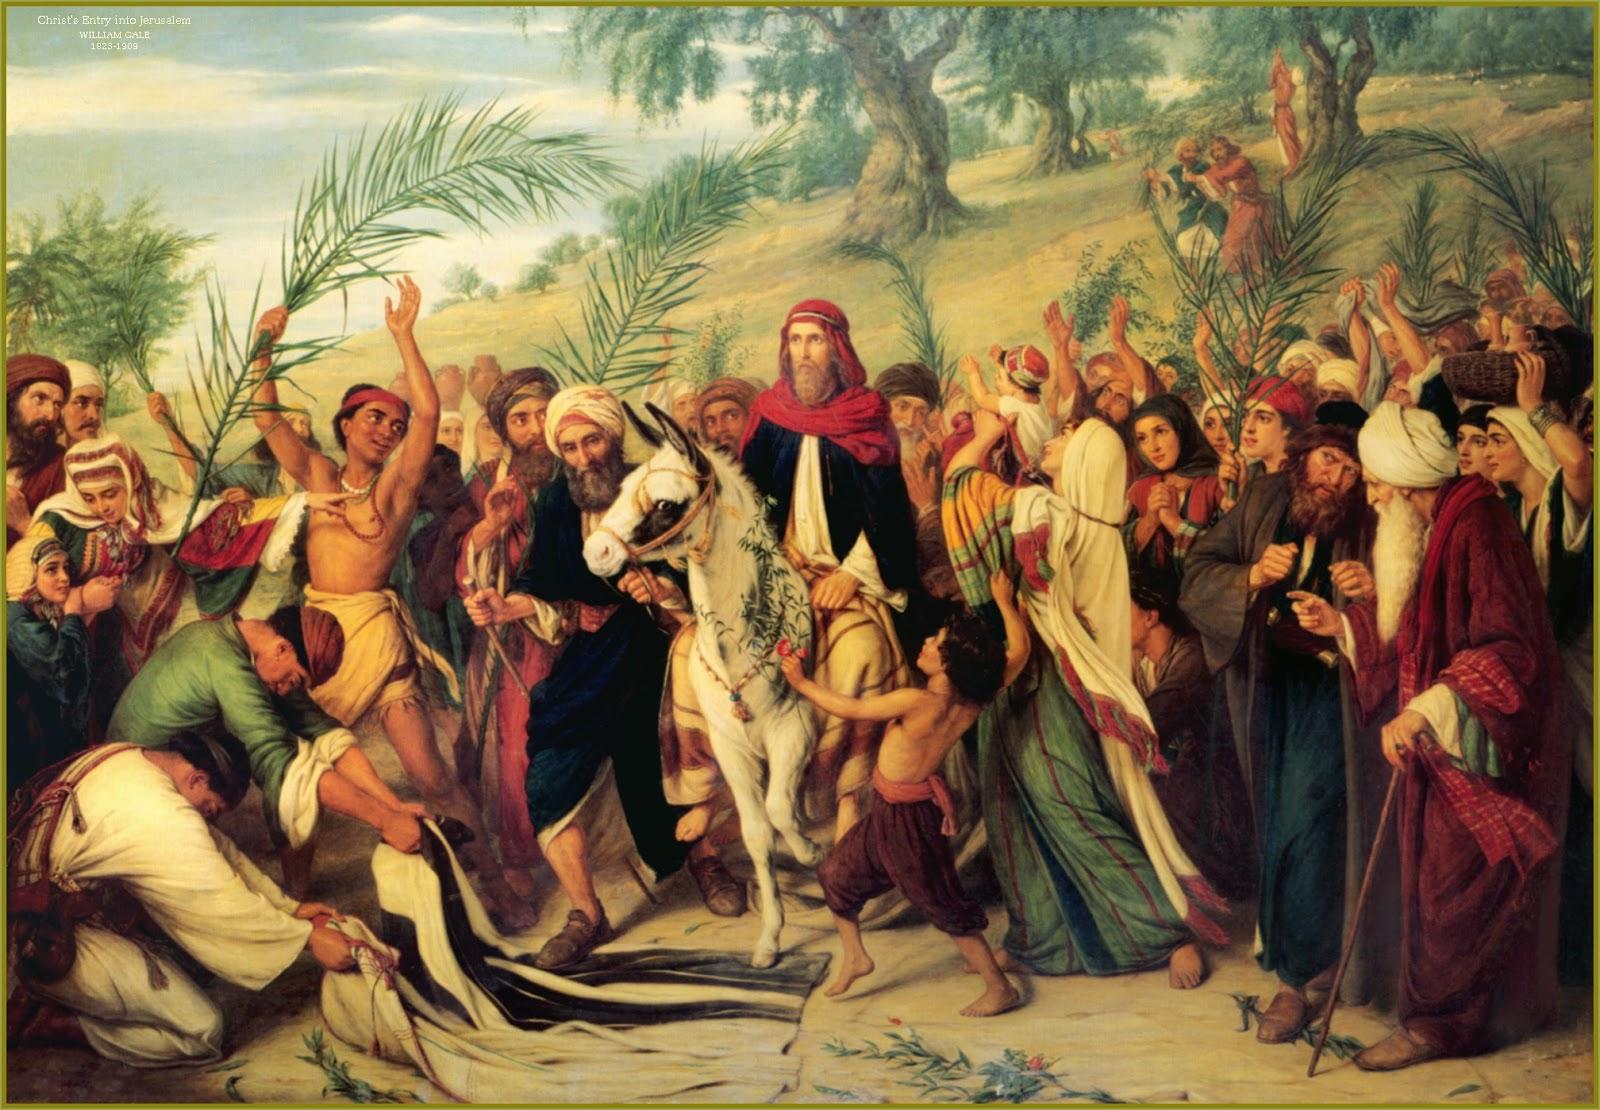 Conscientious Catholic PALM SUNDAY